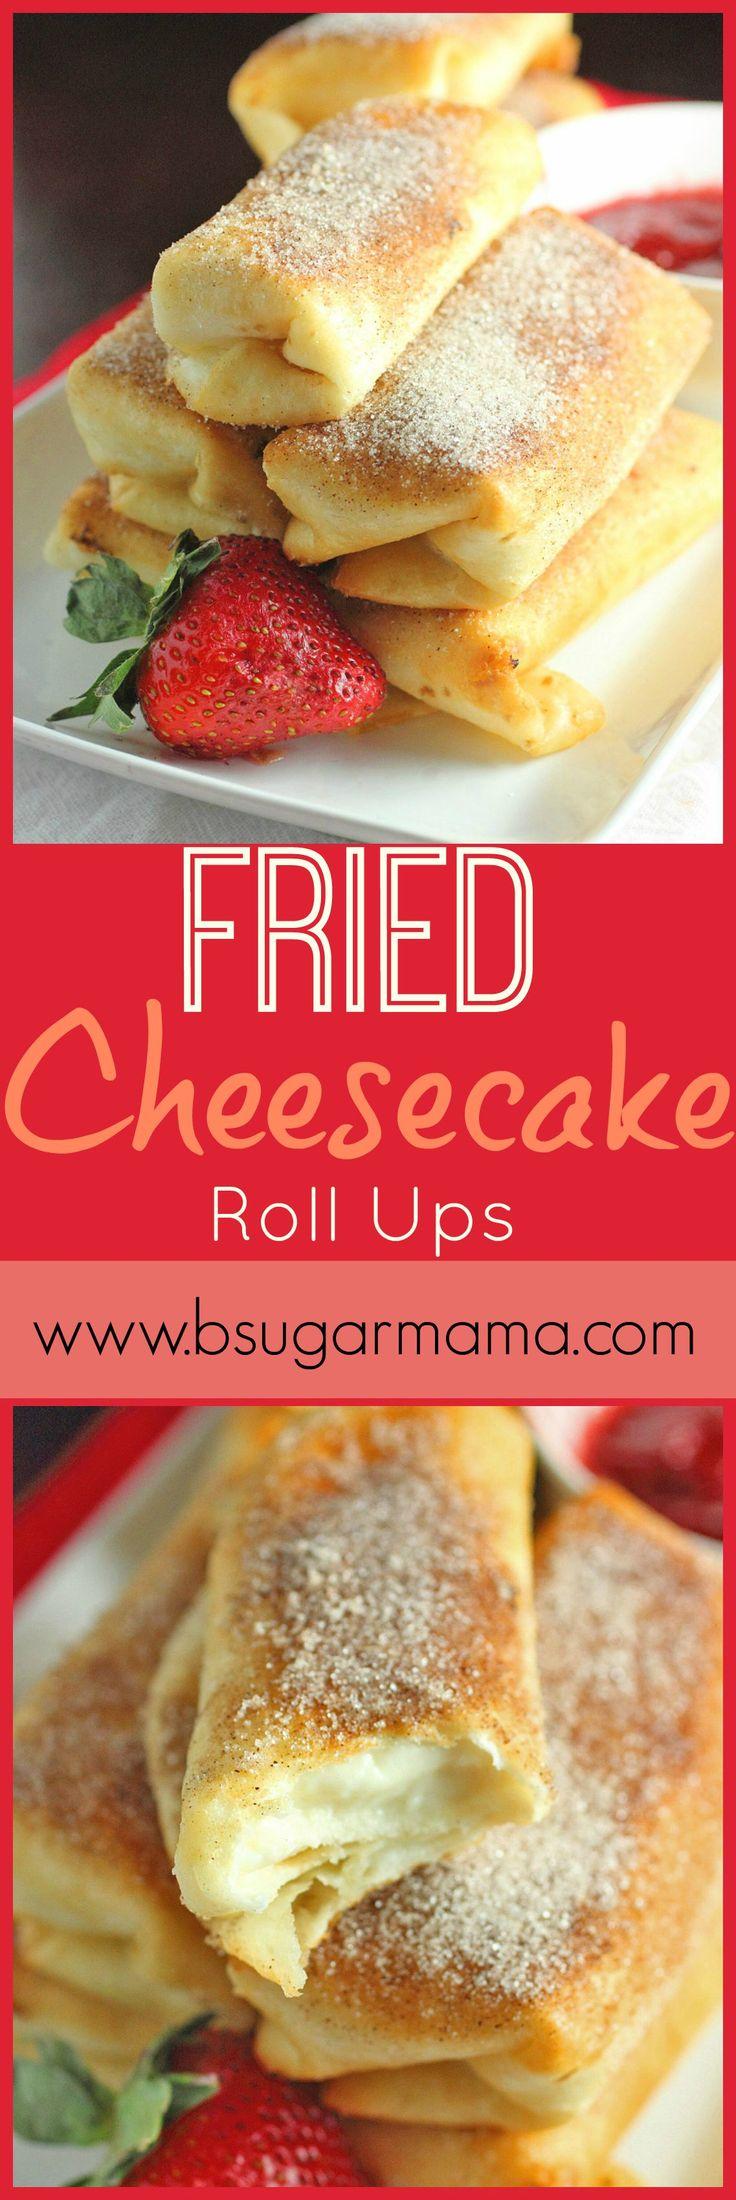 Fried Cheesecake Roll-Ups!